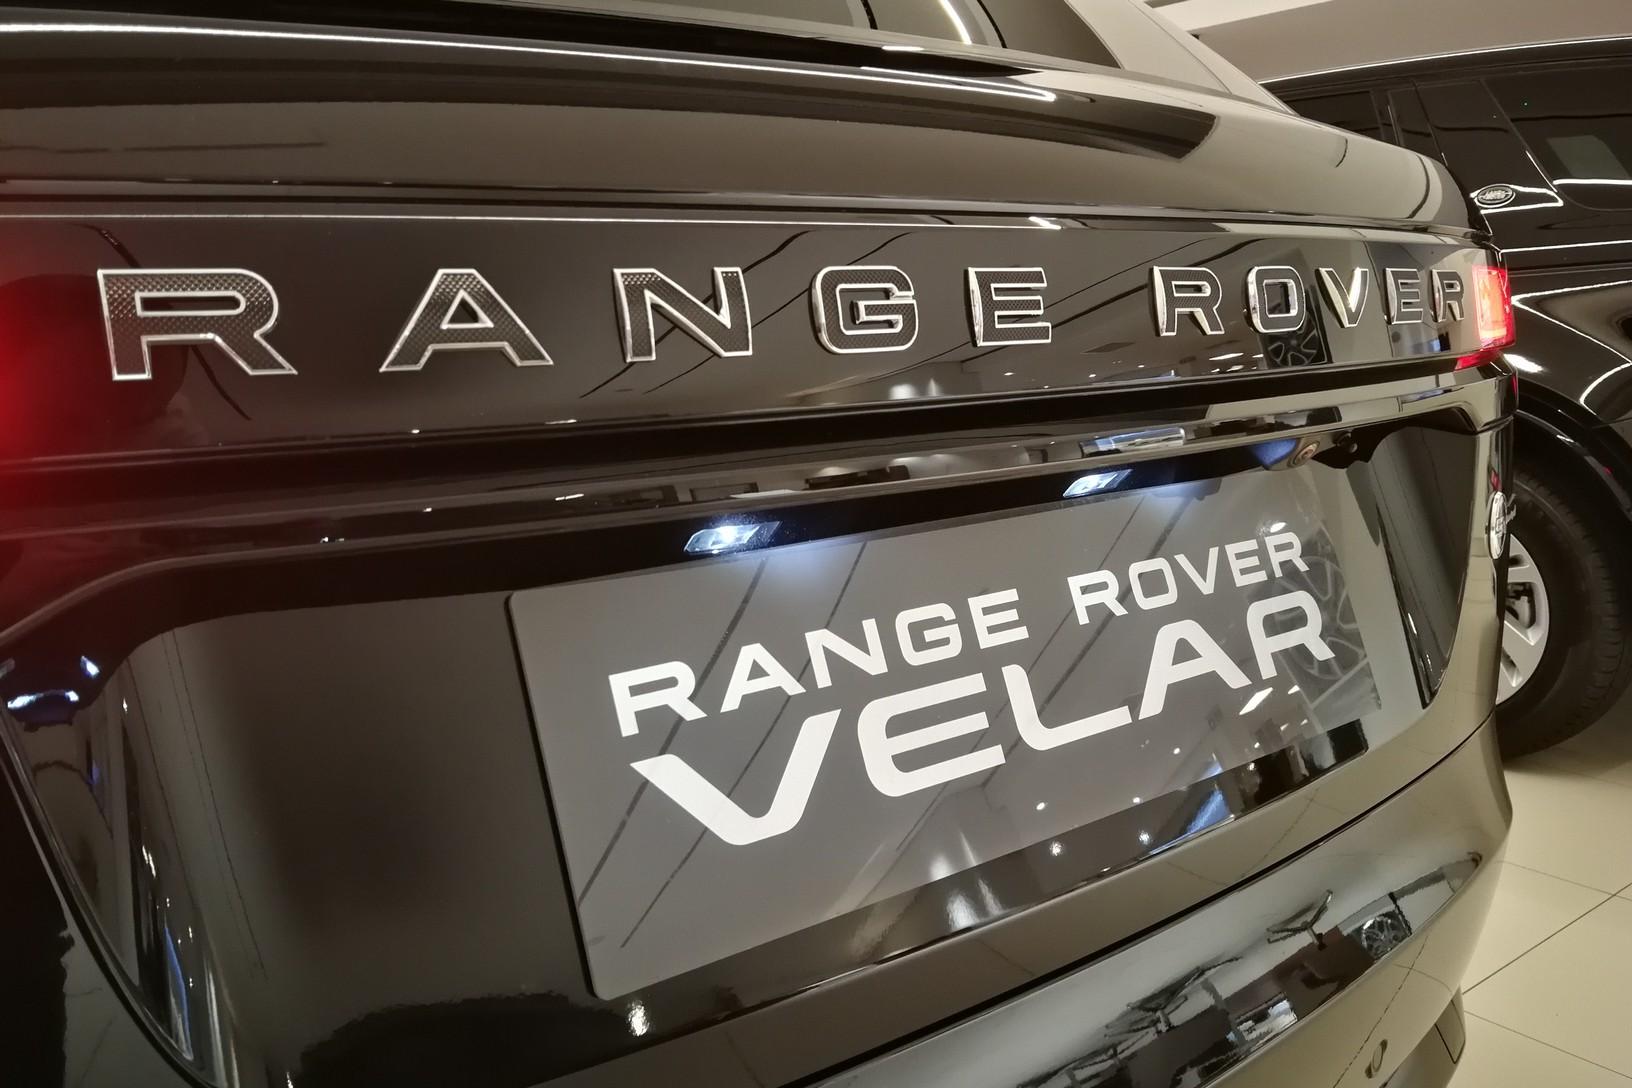 Land Rover Range Rover Velar 5.0 P550 SVAutobiography Dynamic Edition image 9